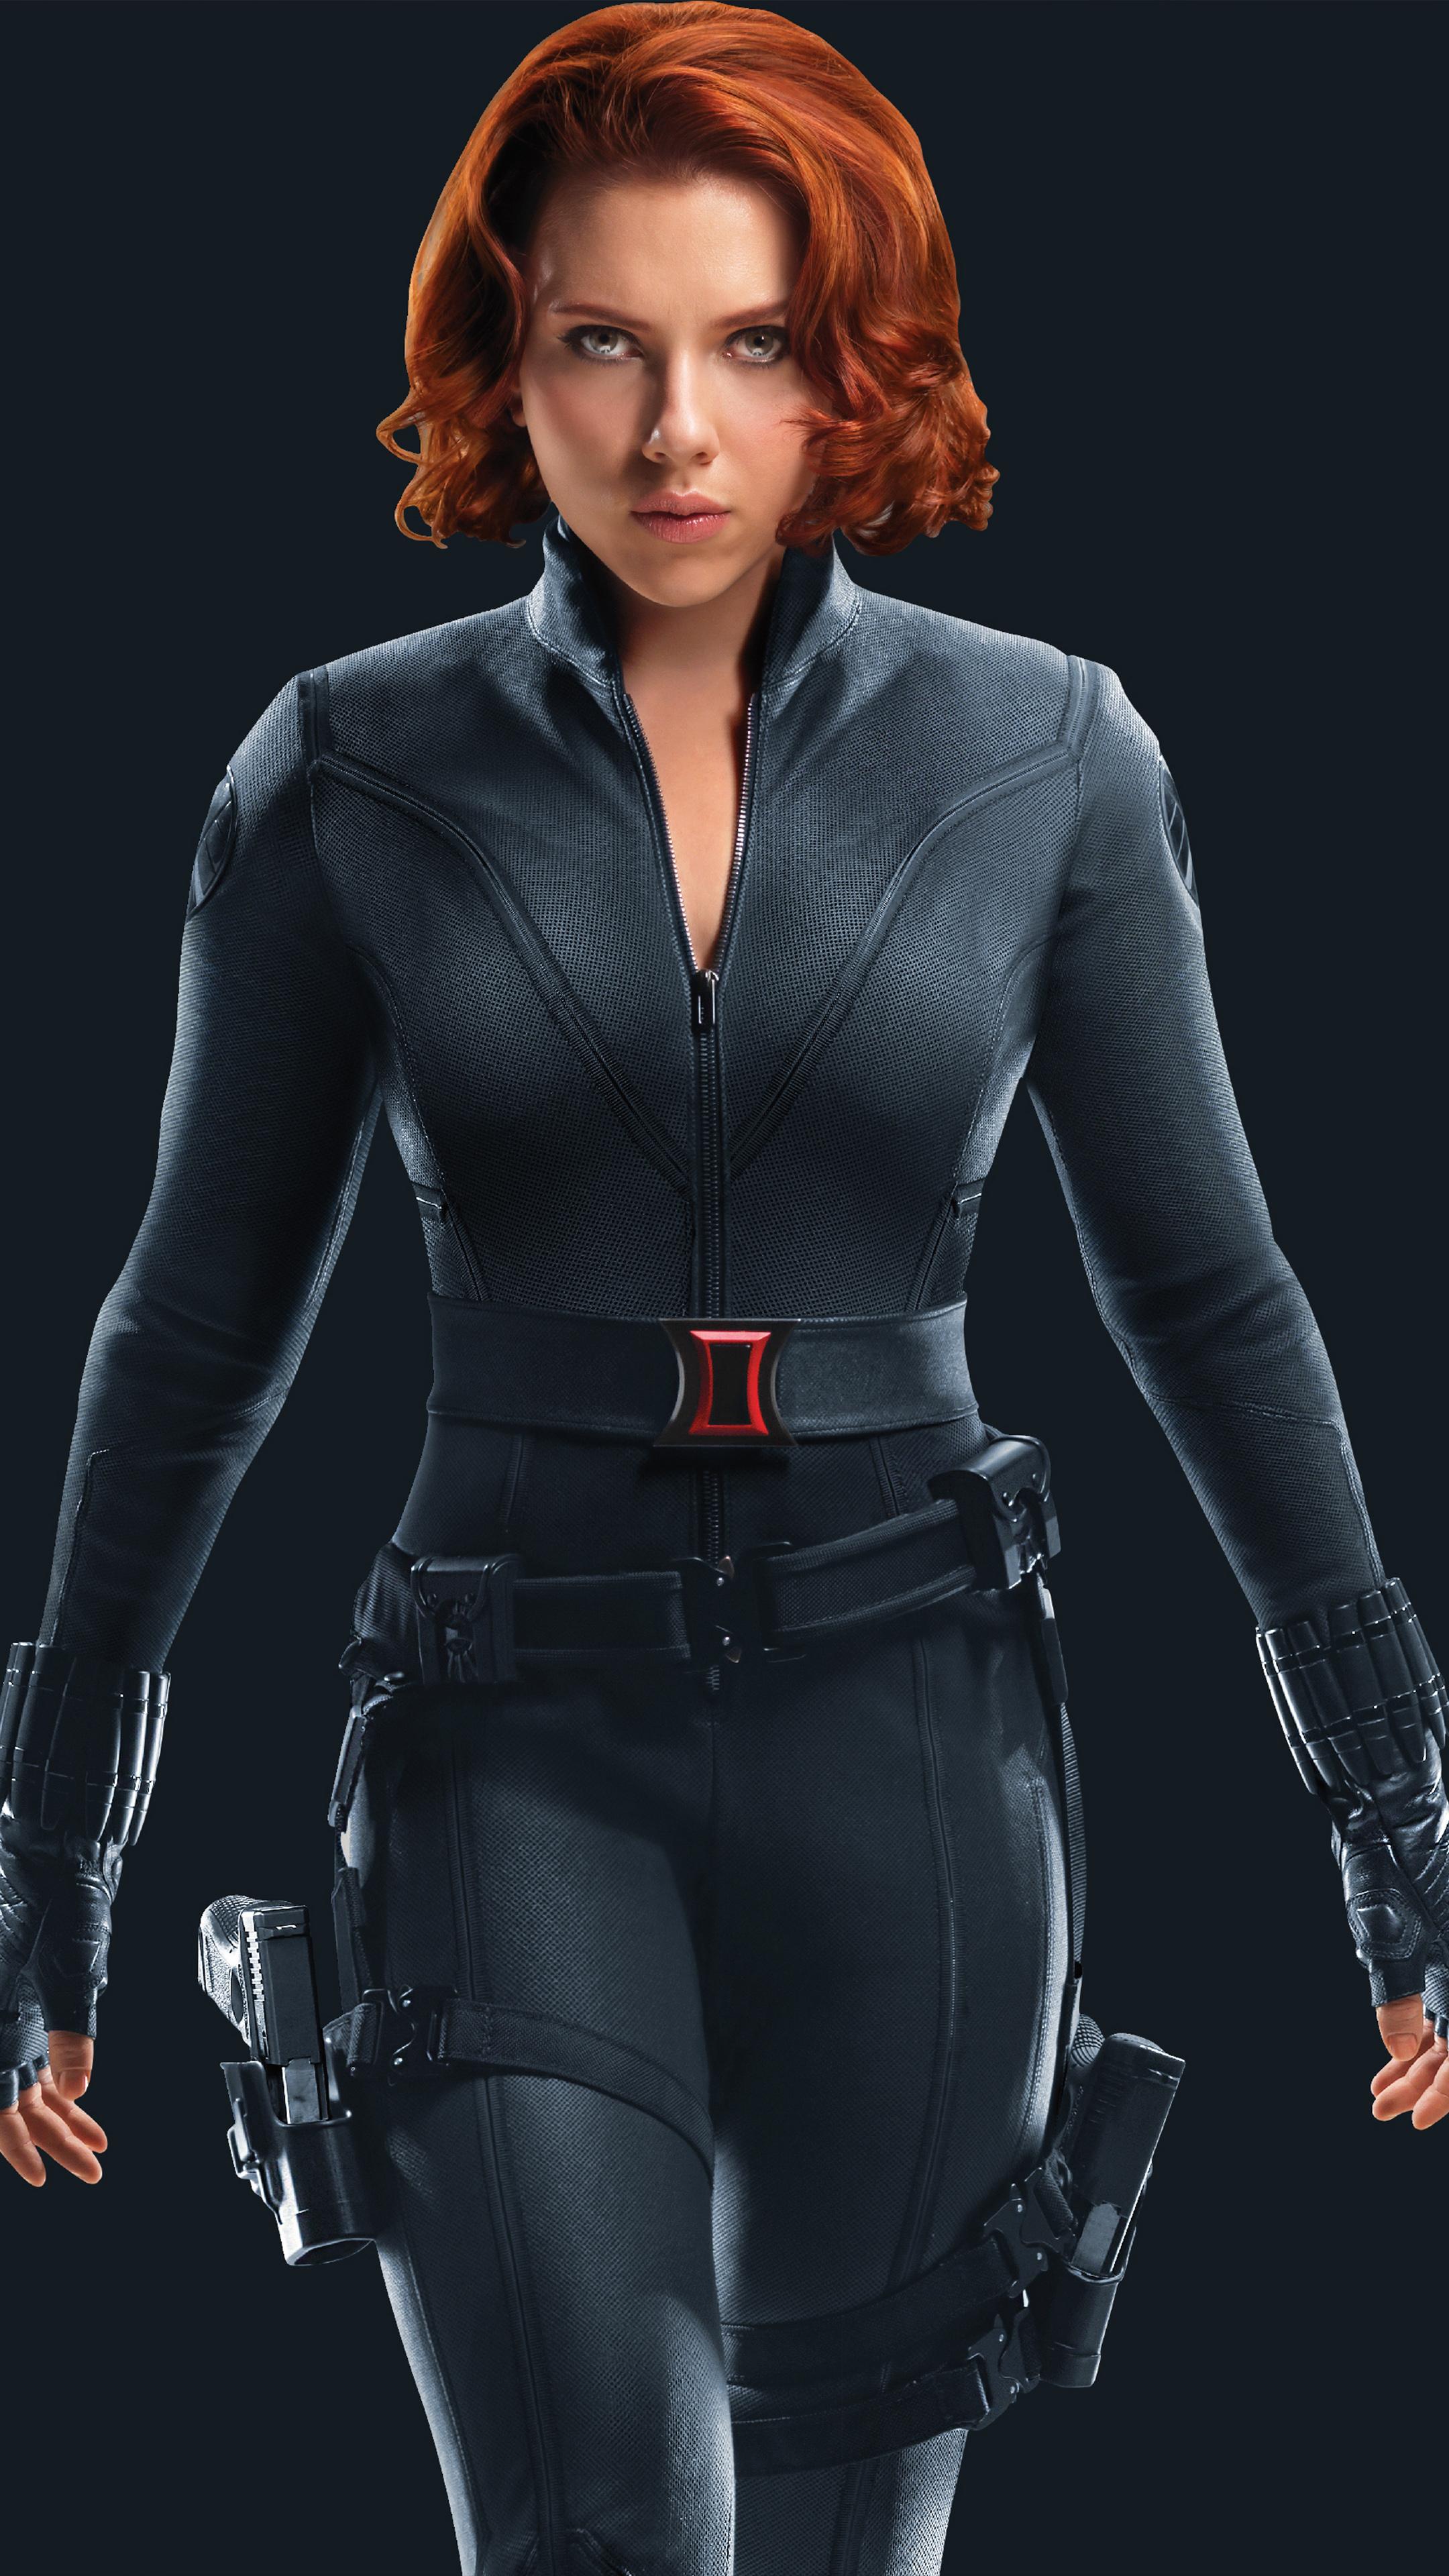 Download Black Widow Scarlett Johansson Superhero Pure 4K 2160x3840